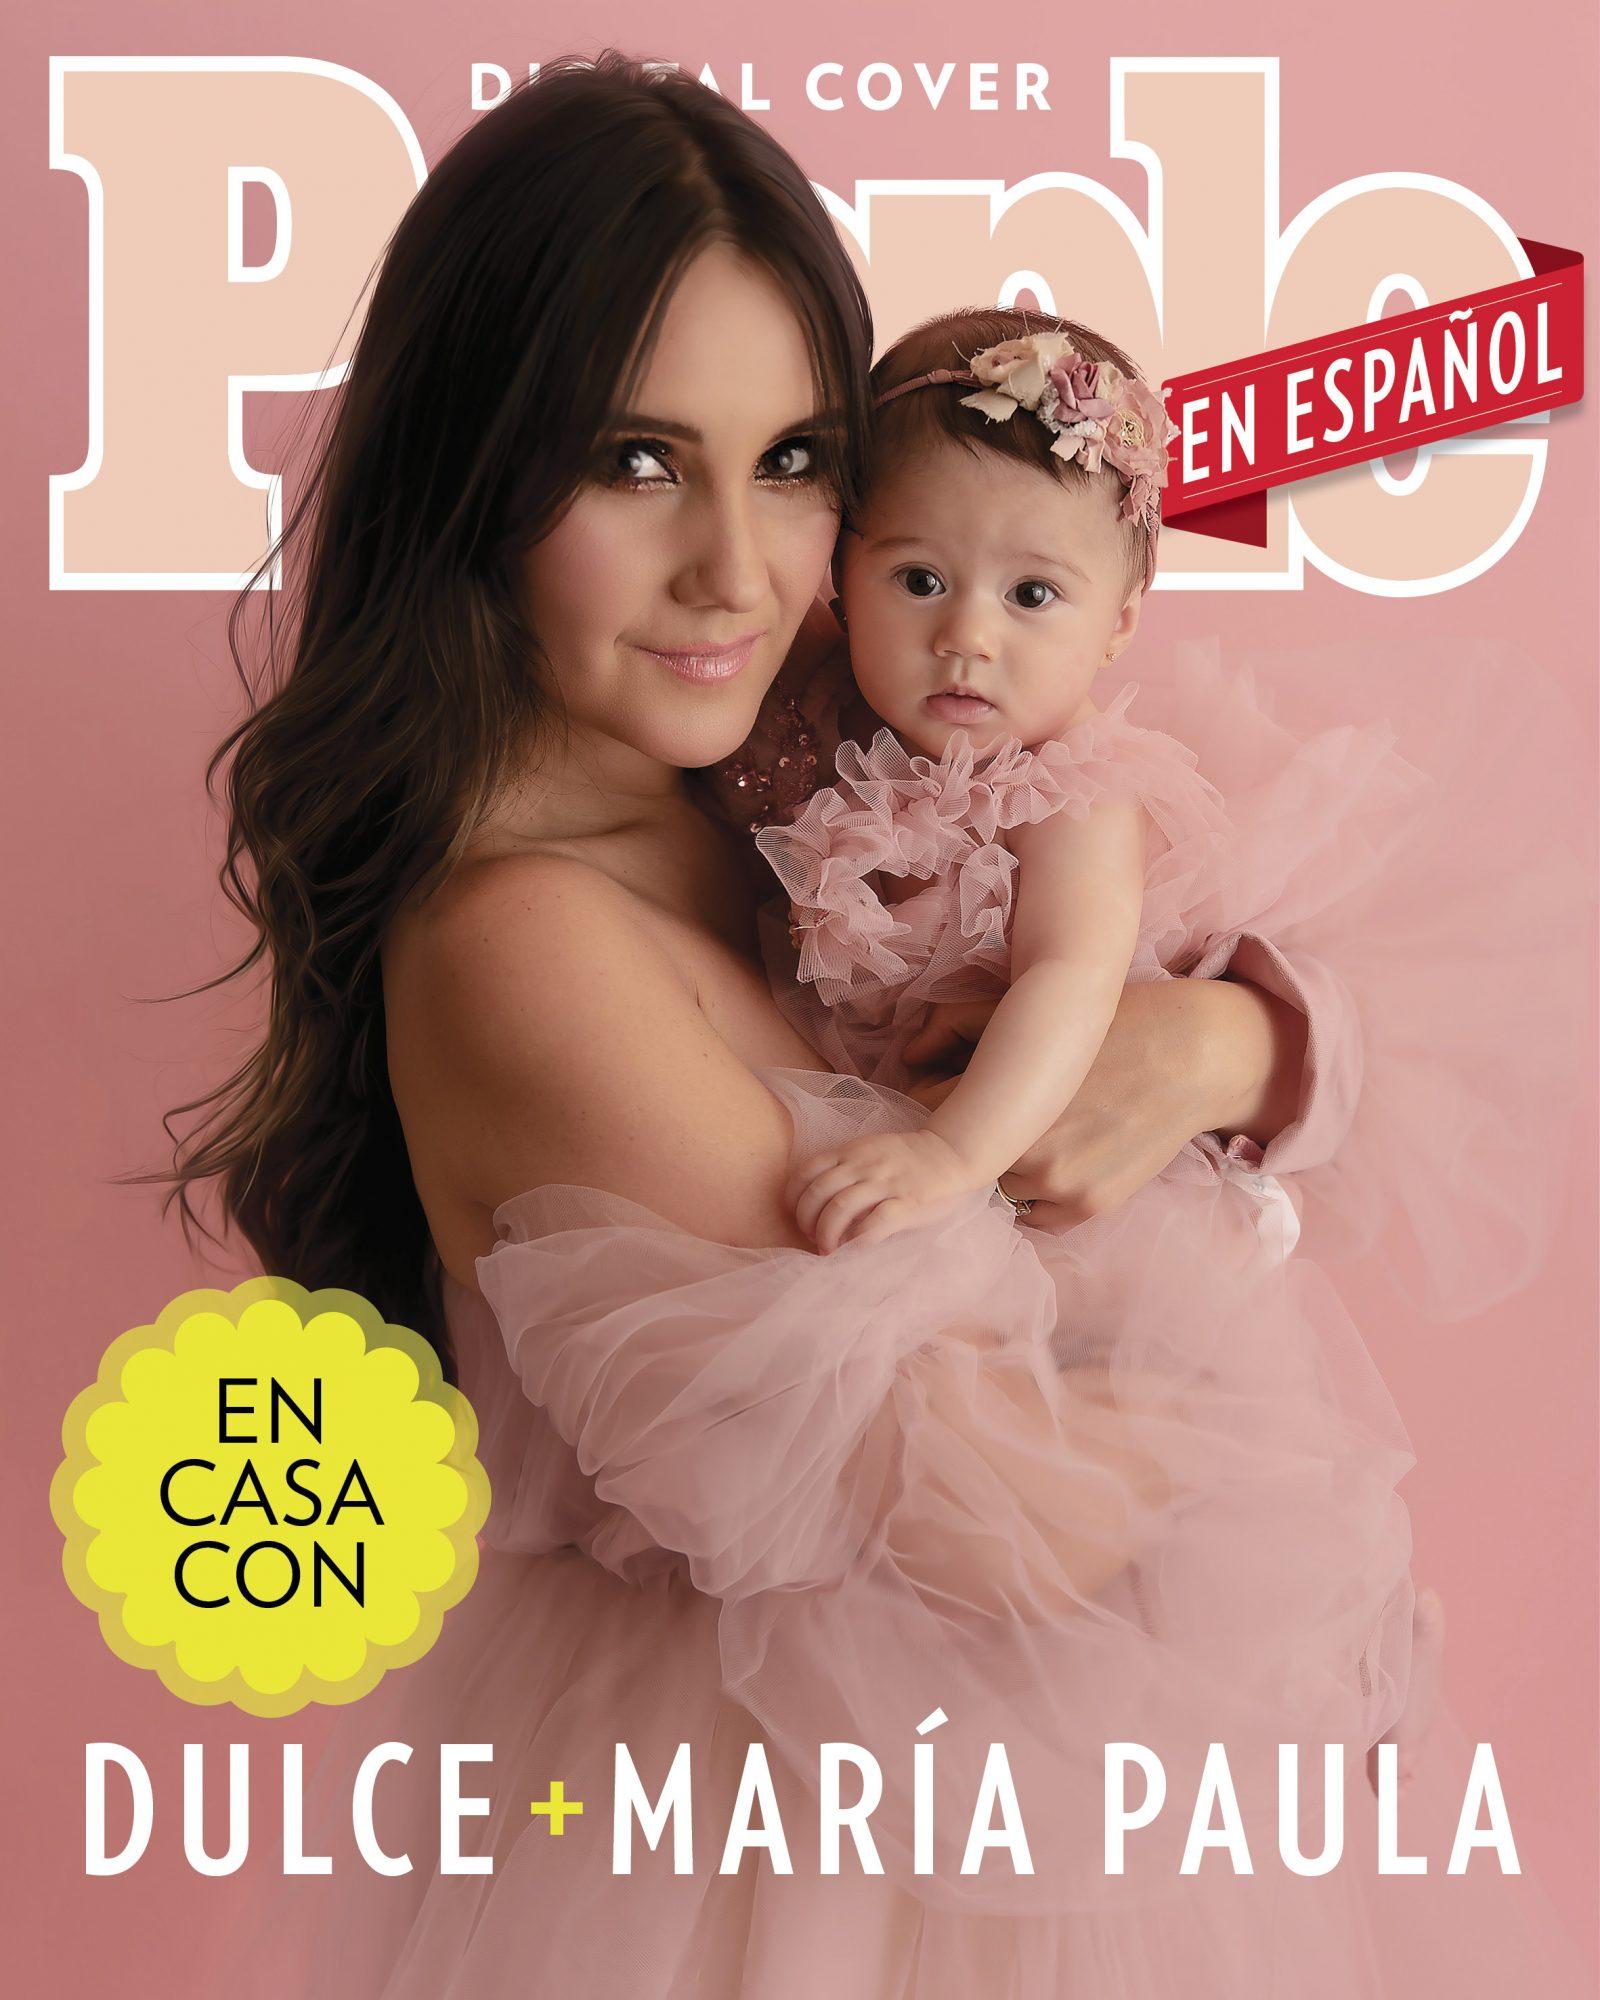 Dulce Maria y Maria Paula - Digital Cover - DO NOT REUSE